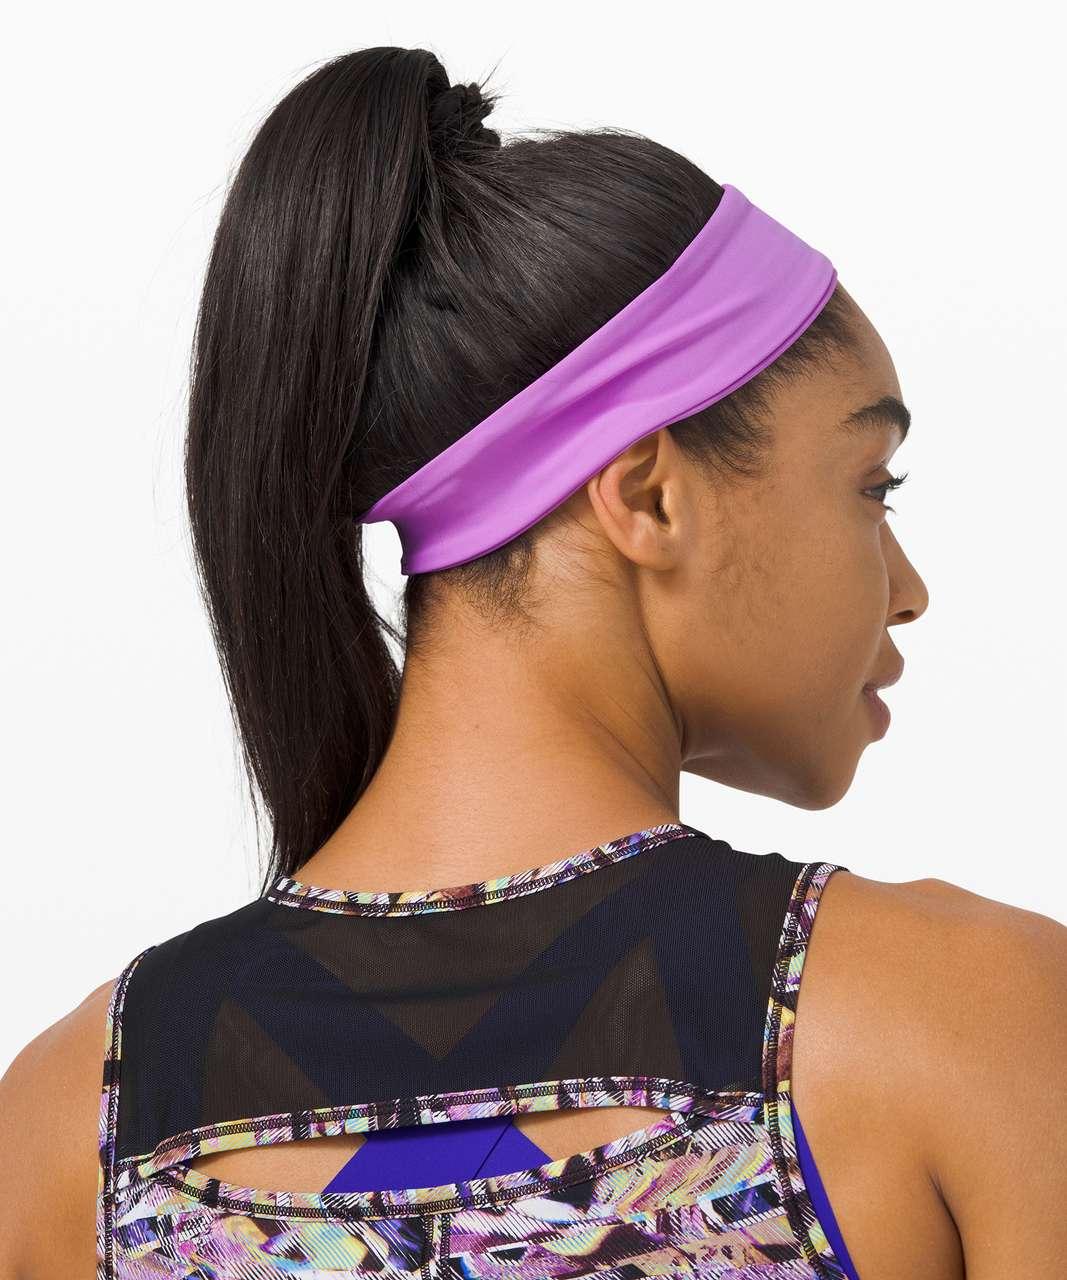 Lululemon Fly Away Tamer Headband II *SeaWheeze - Purple Blossom